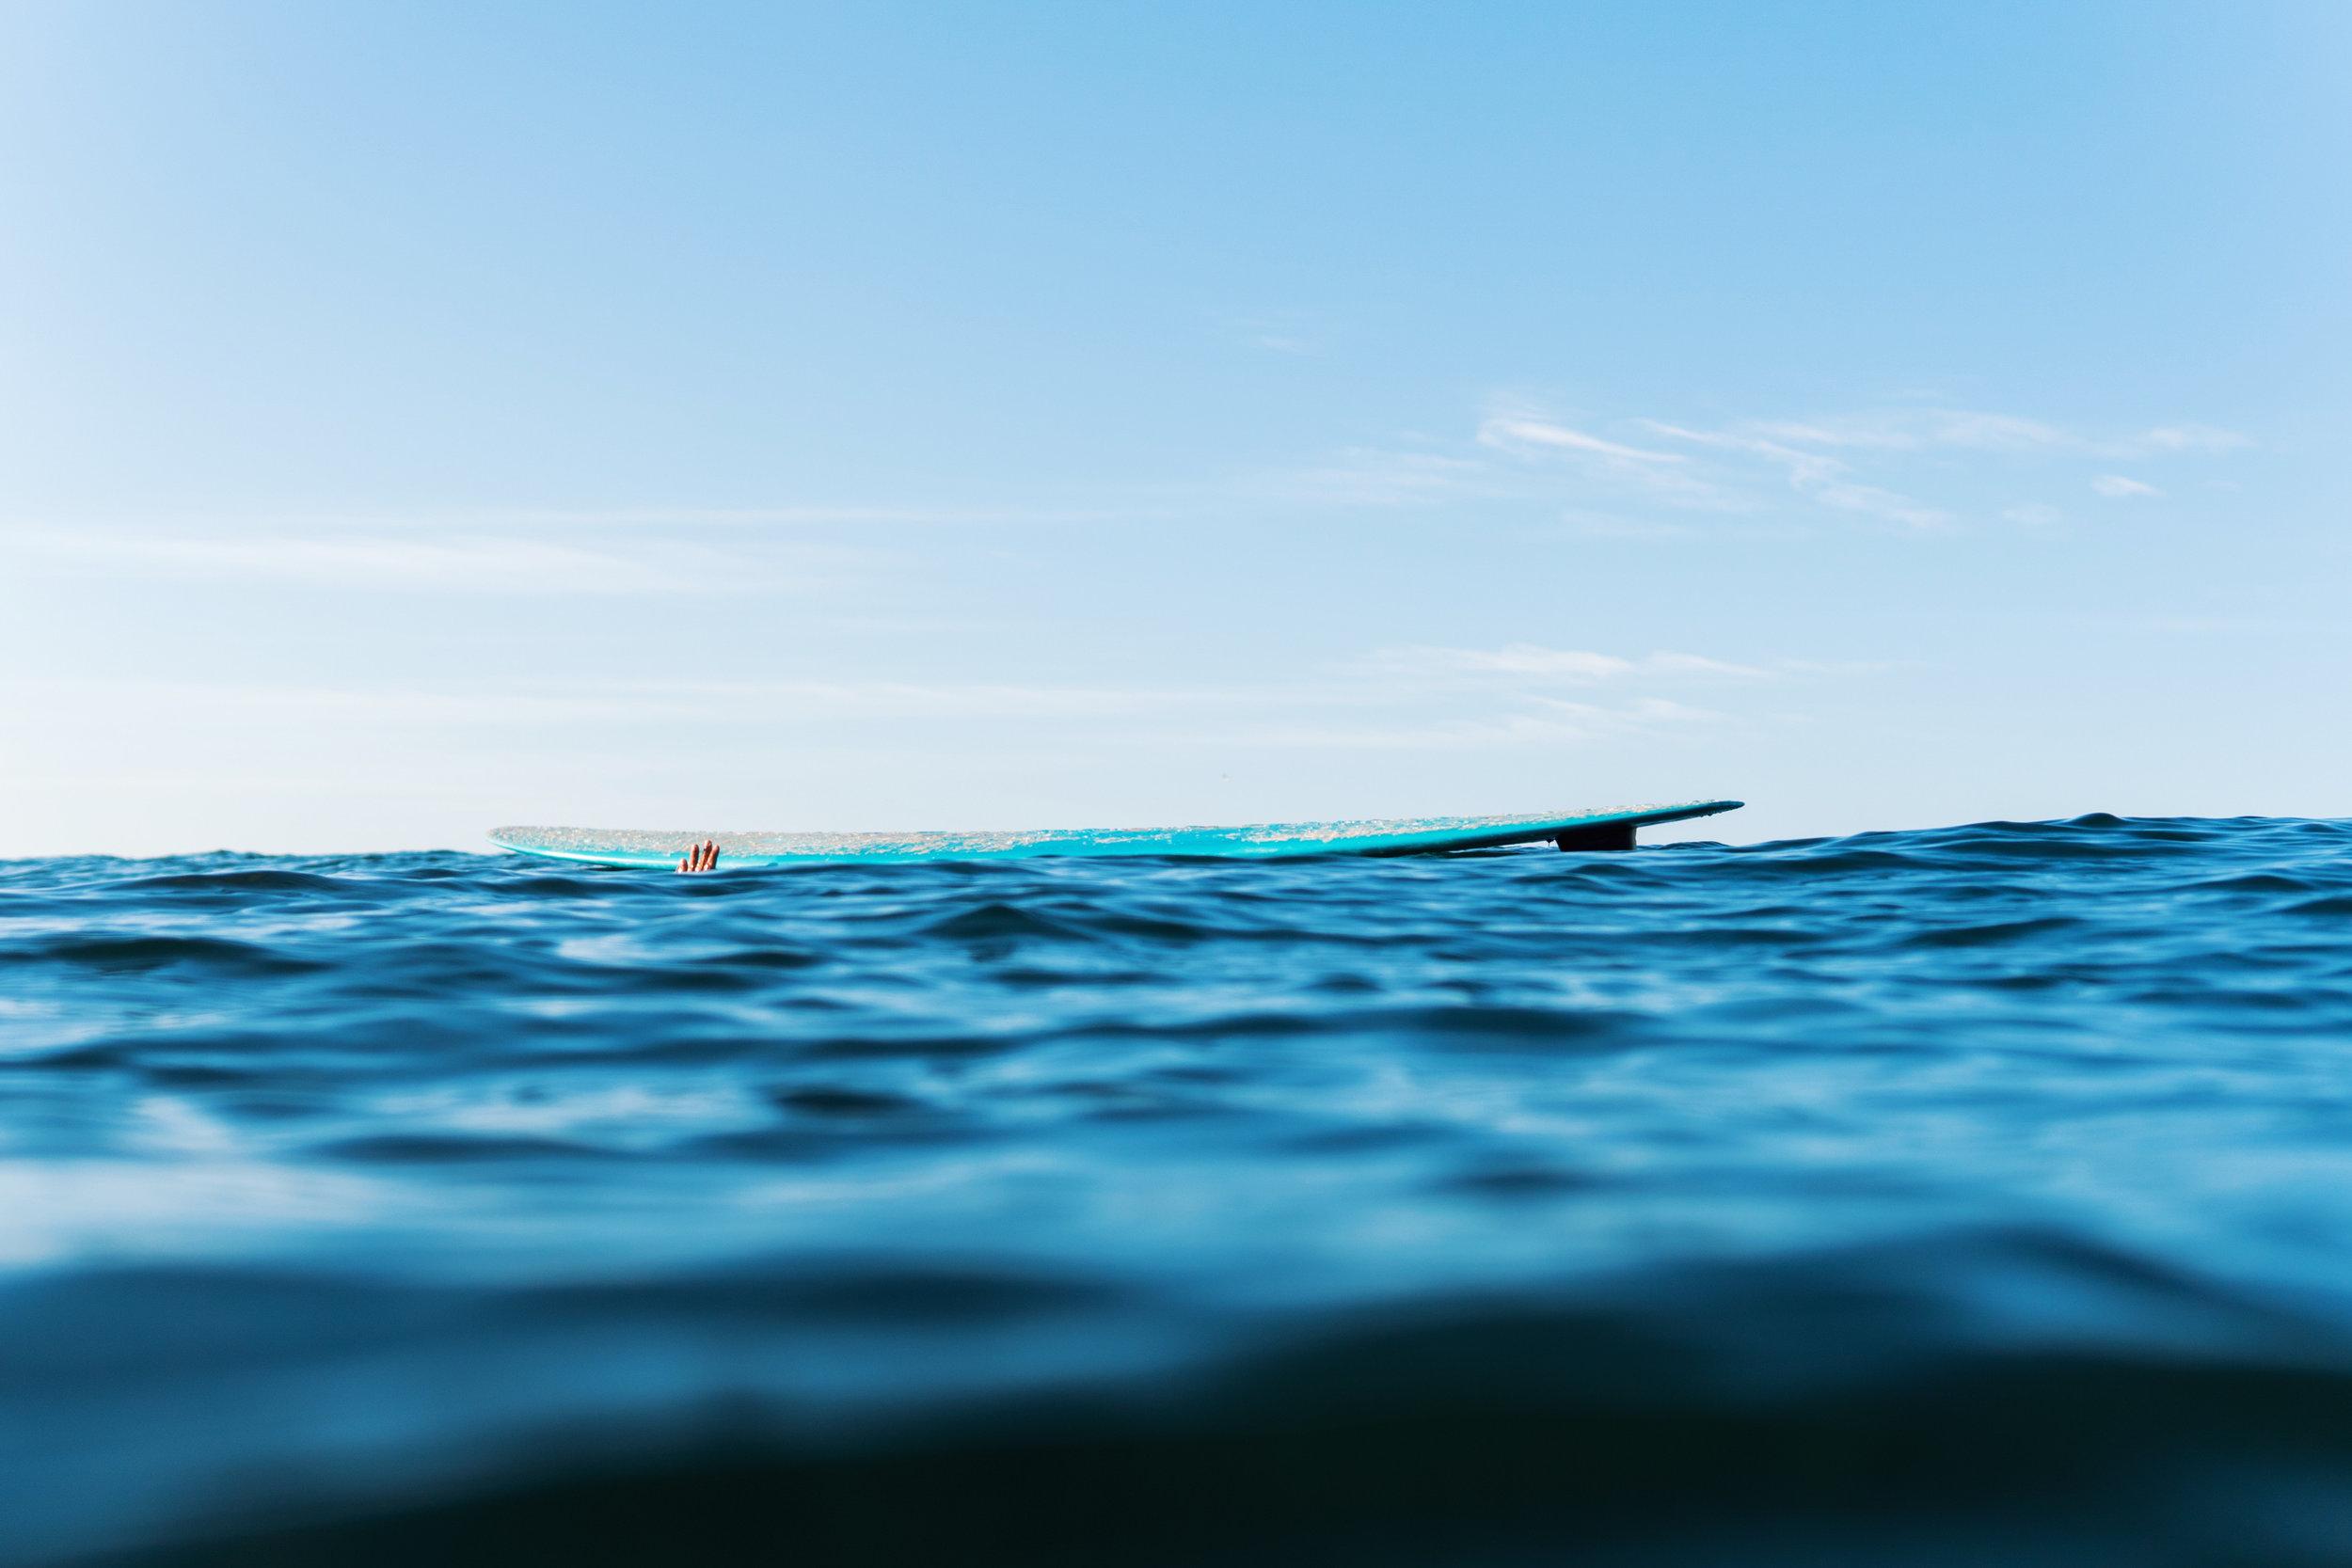 Surf-Mexico-Zihuatanejo-Sayulita-Ixtapa-Zihuatanejo-Diego-Cadena-Olas-Fotografia-Heiko-Bothe-5.jpg